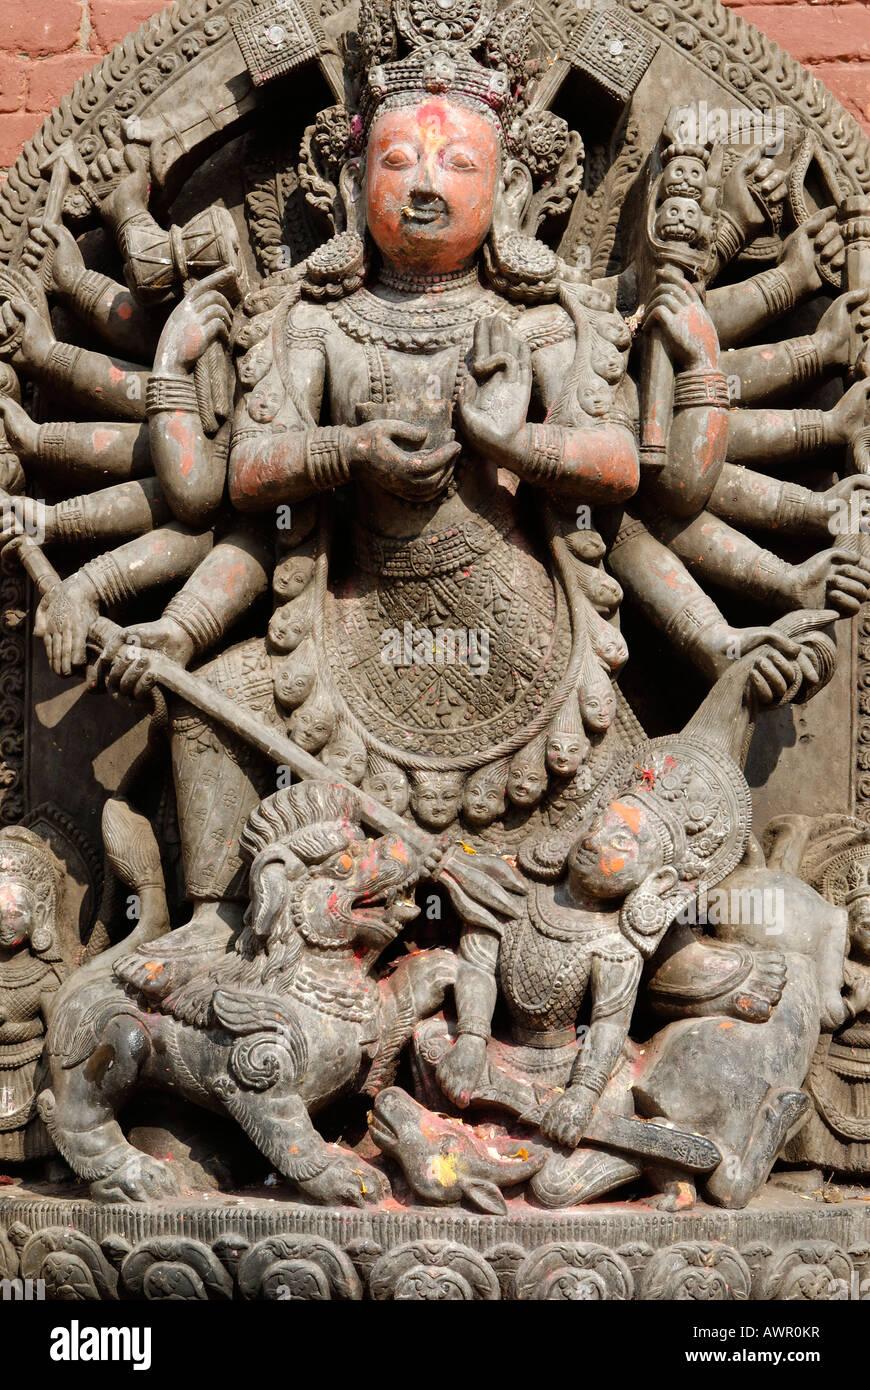 Hinduistische Statue, Durbar Square von Patan, Lalitpur, Kathmandu, Nepal Stockbild